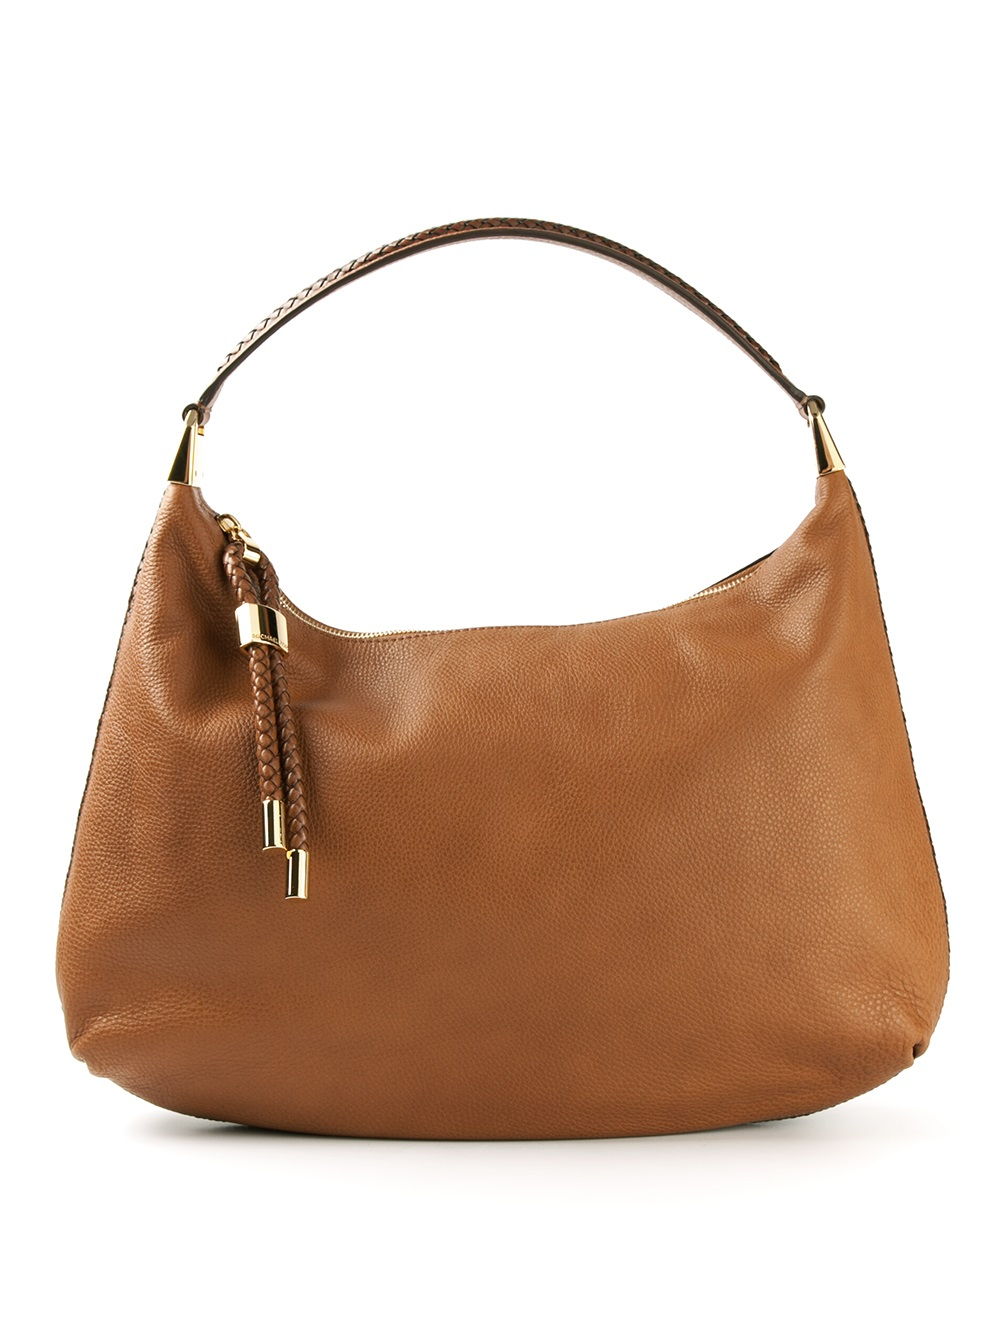 michael kors skorpios hobo shoulder bag in brown lyst. Black Bedroom Furniture Sets. Home Design Ideas